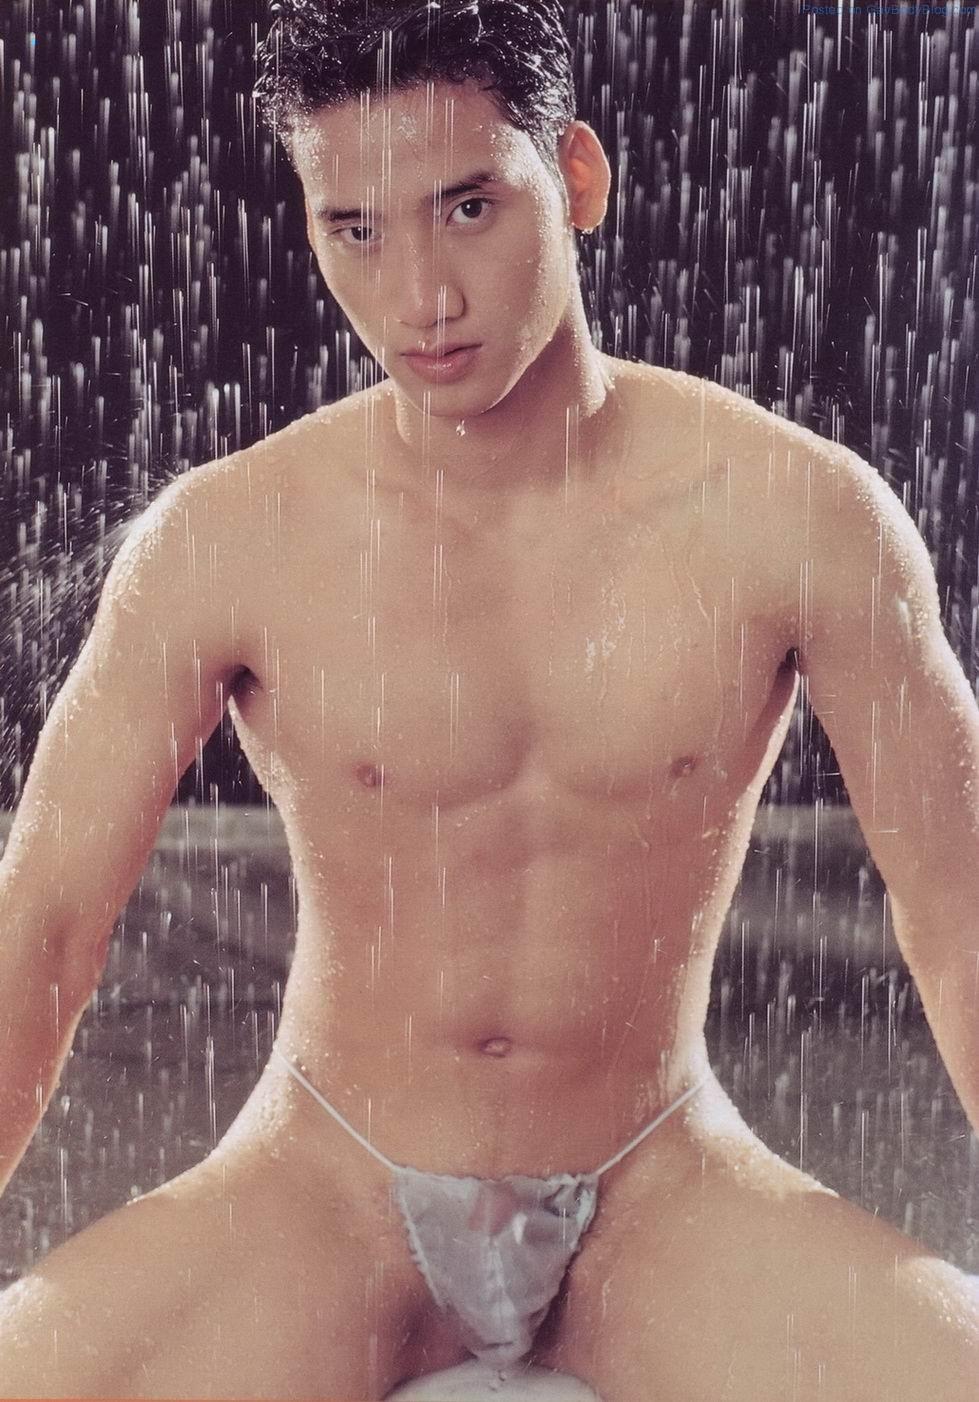 tumblr gay Asian dick